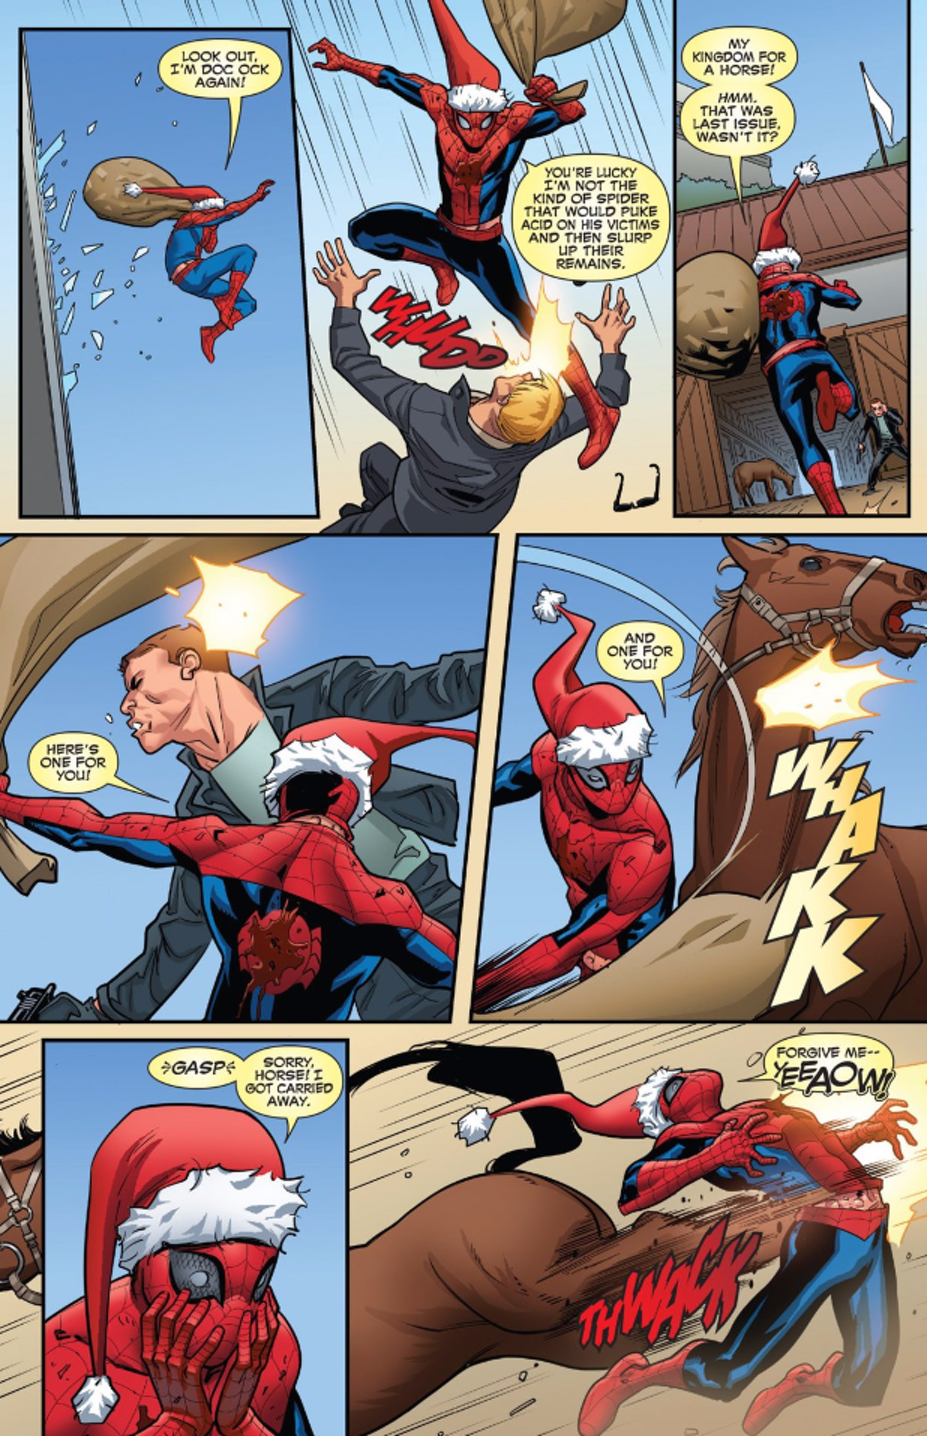 Panel from Marvel's Deadpool #22